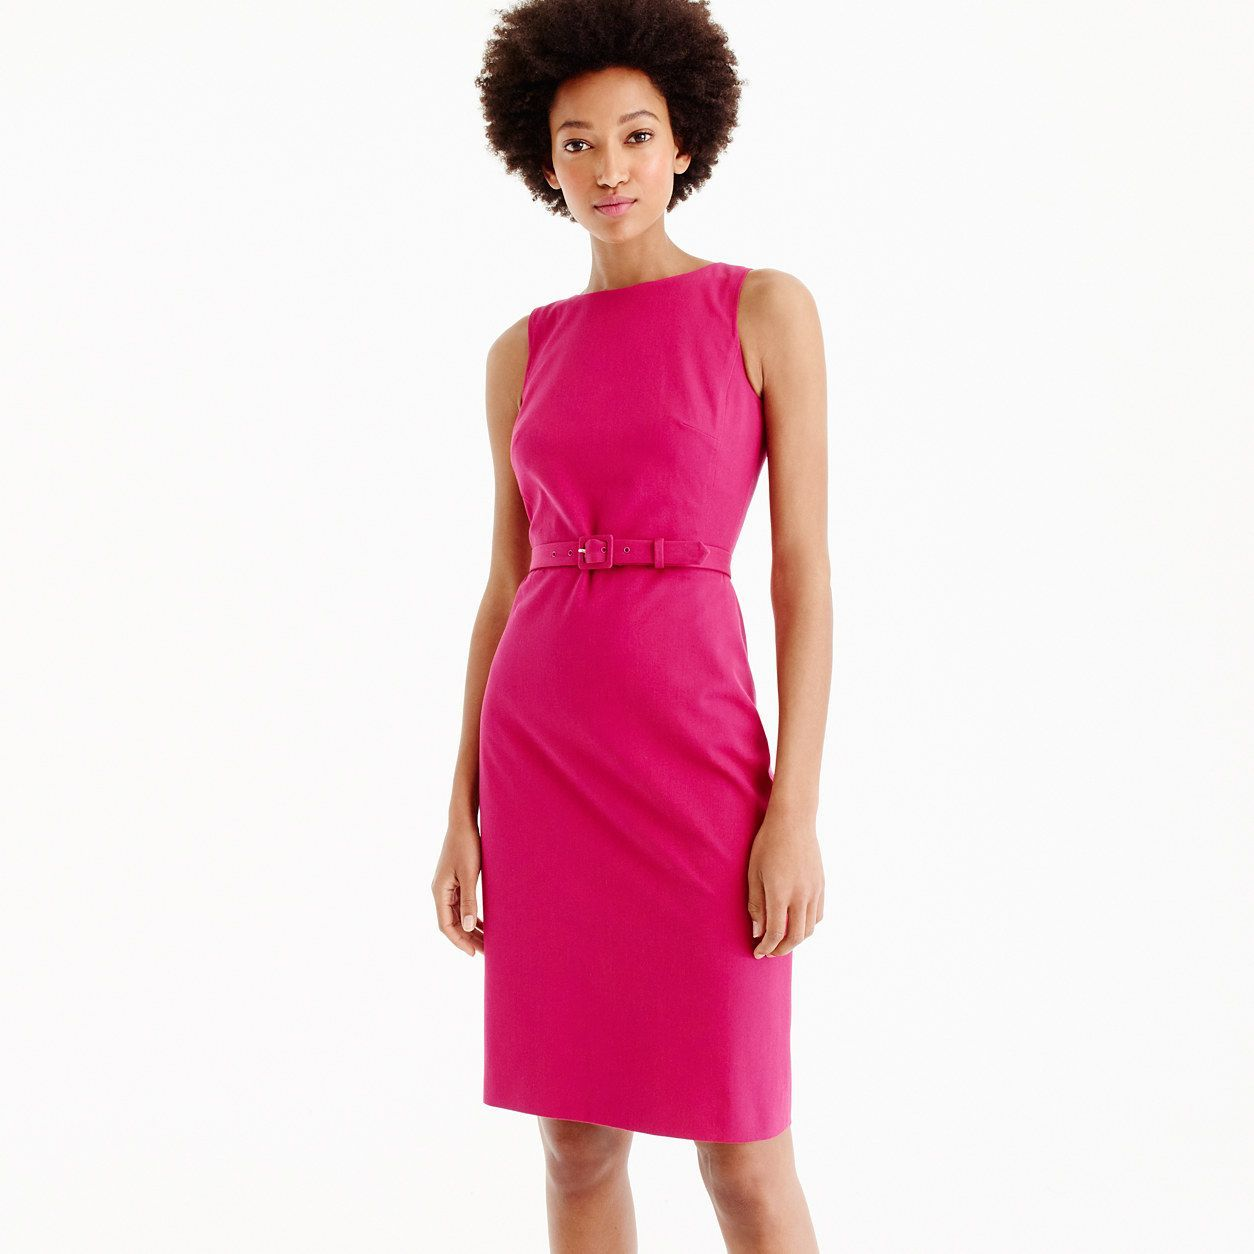 7afd1d4c3373 Petite Dresses Dillards - PostParc